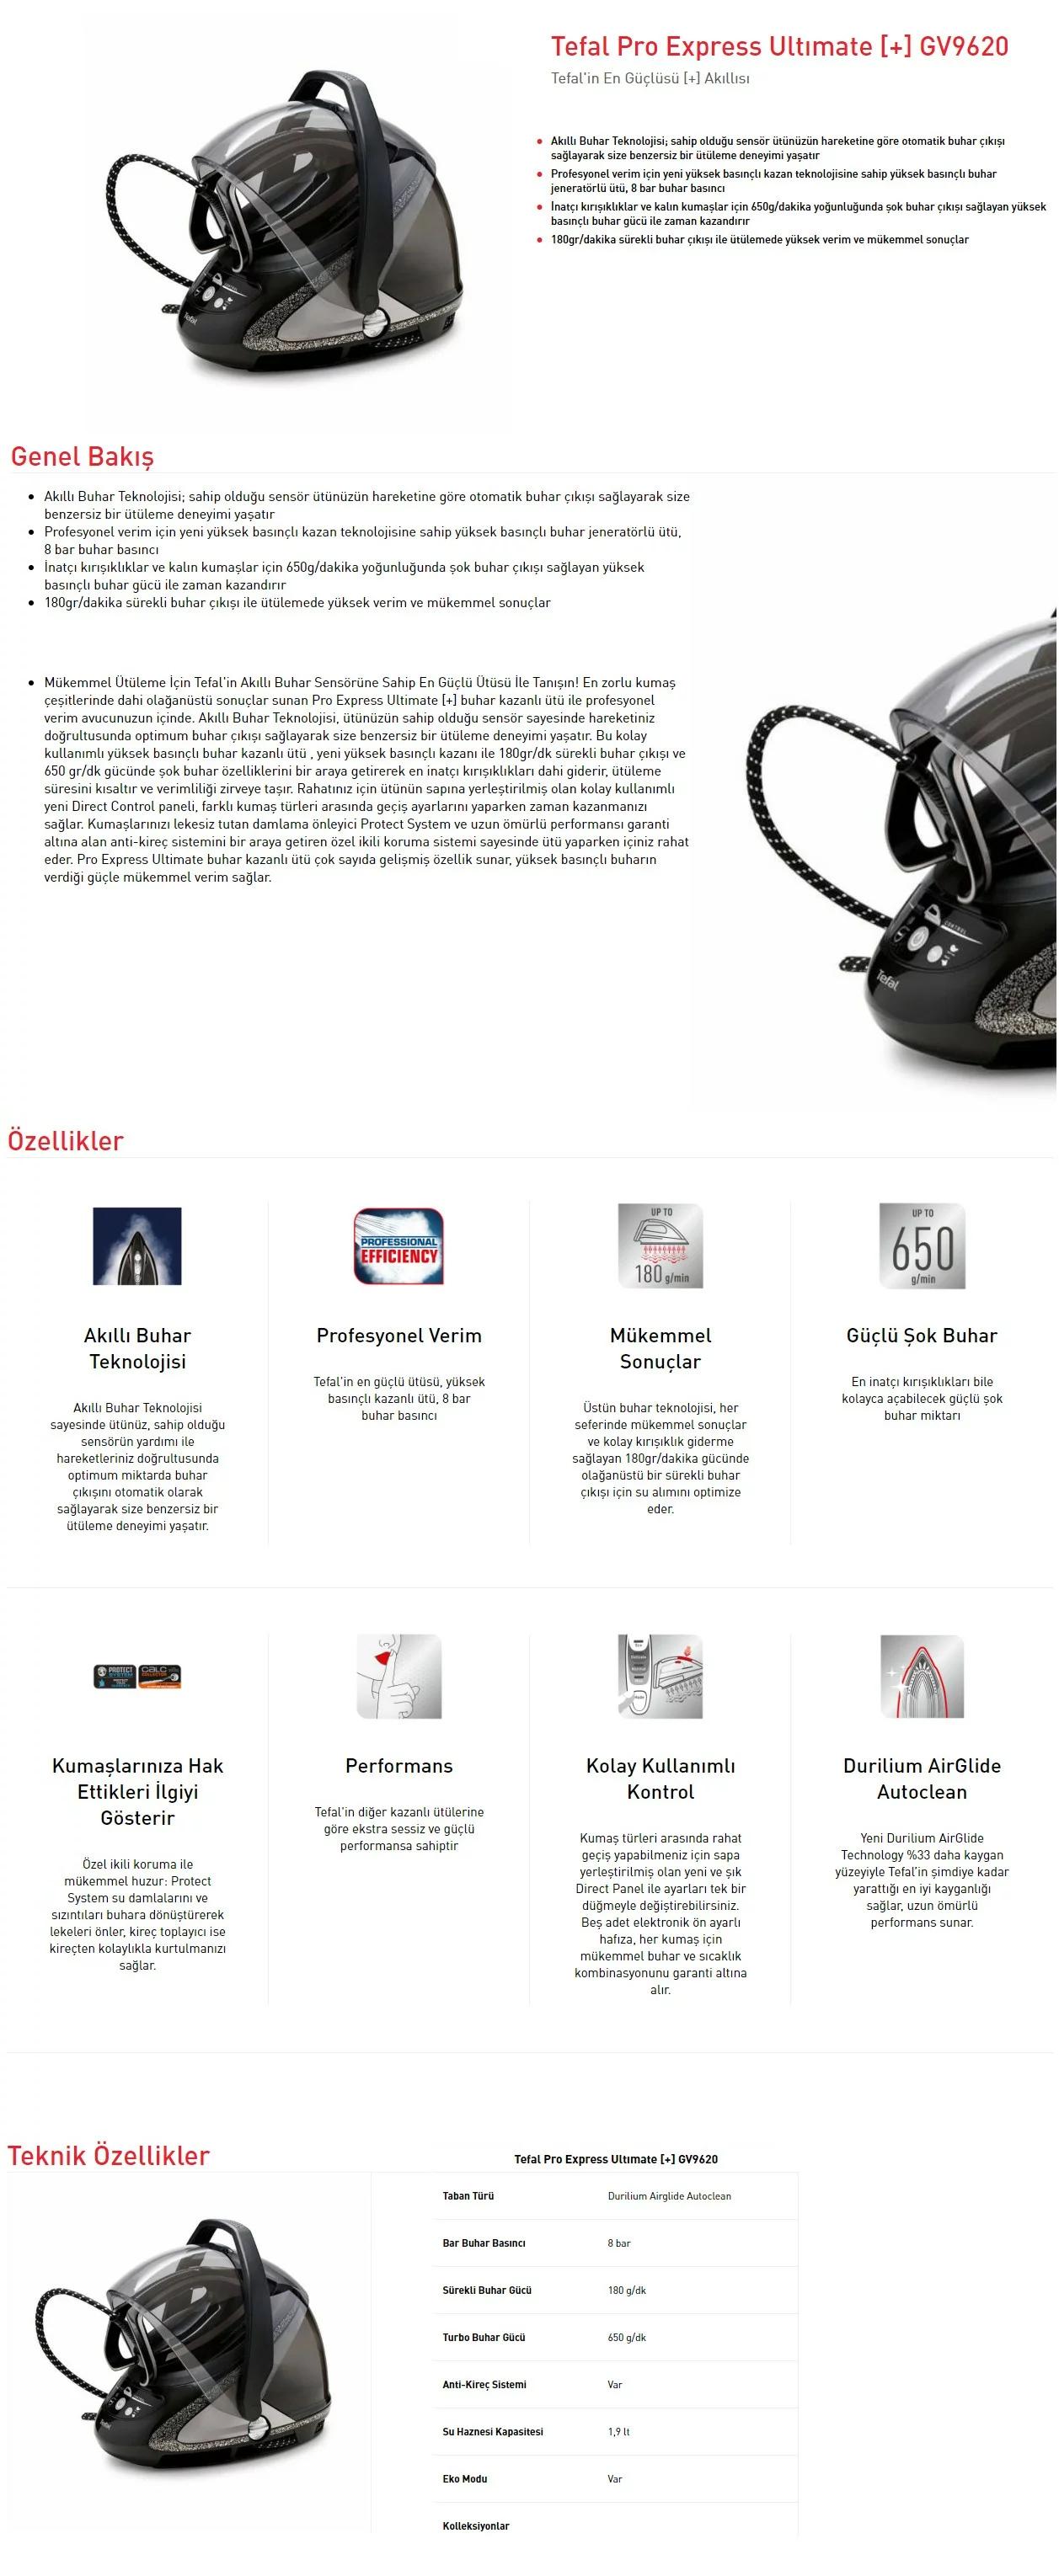 Tefal GV9620 Pro Express Ultimate Ütü Özellikleri